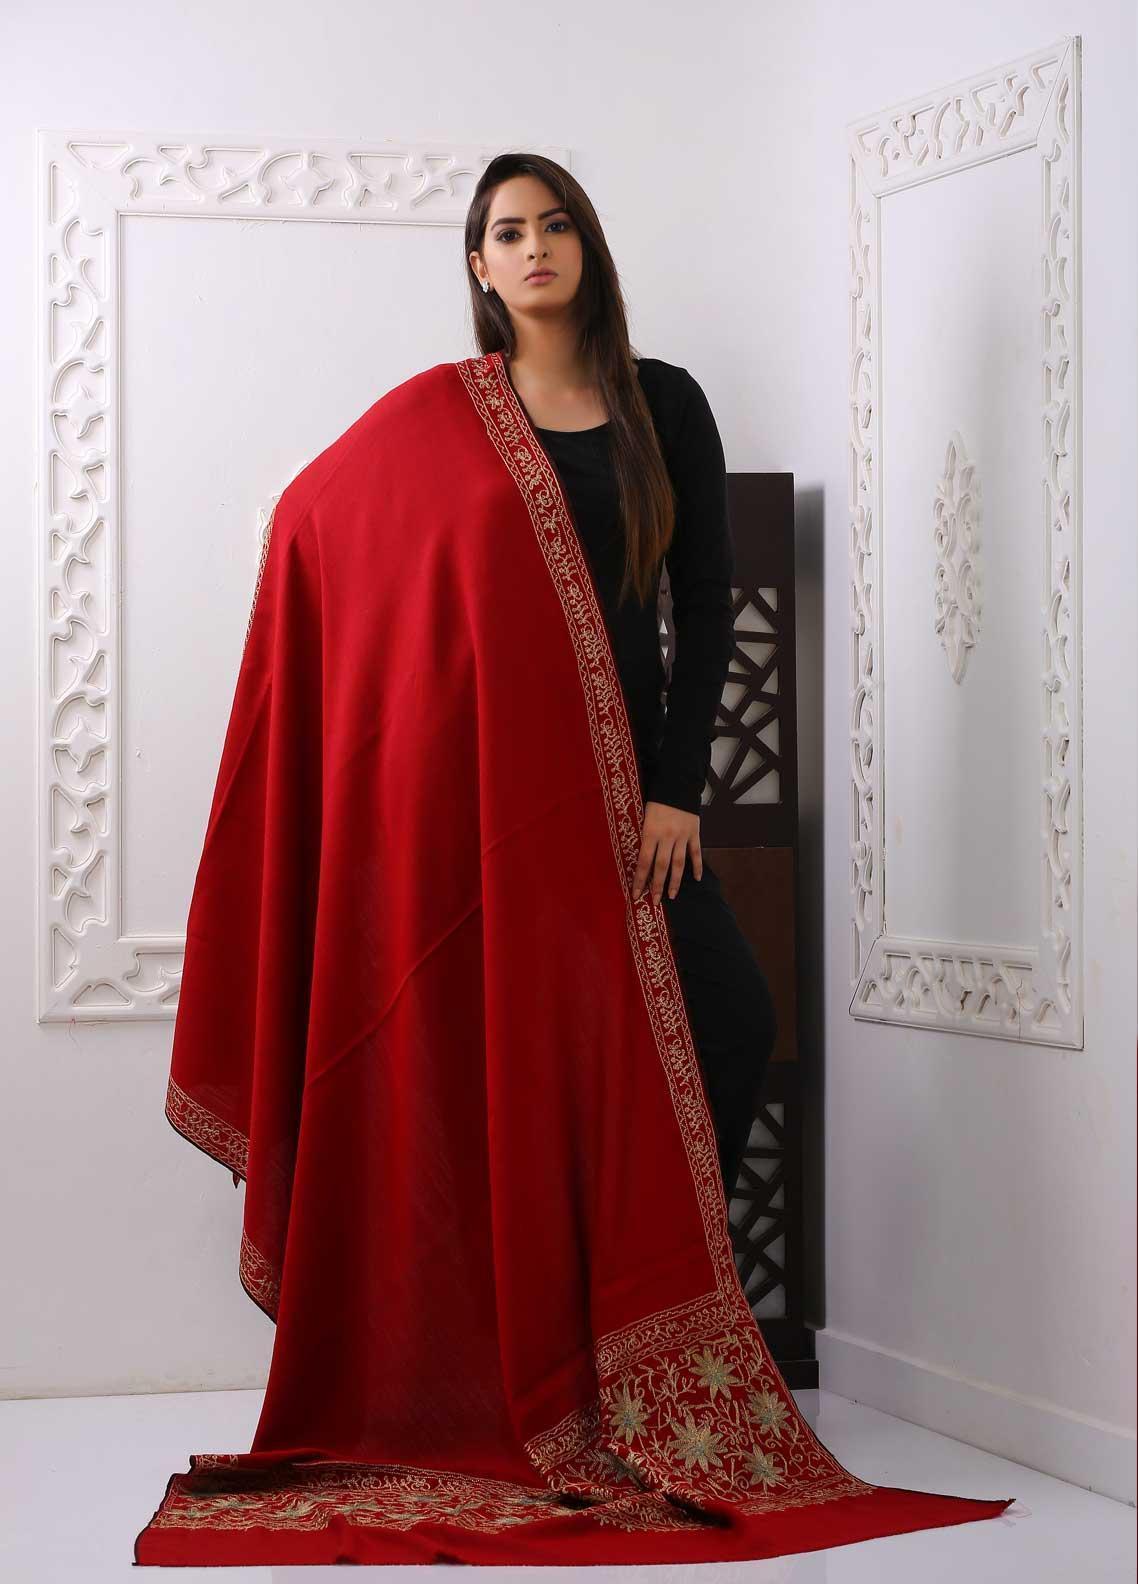 Sanaulla Exclusive Range Embroidered Pashmina  Shawl PMSH 324081 - Pashmina Shawls